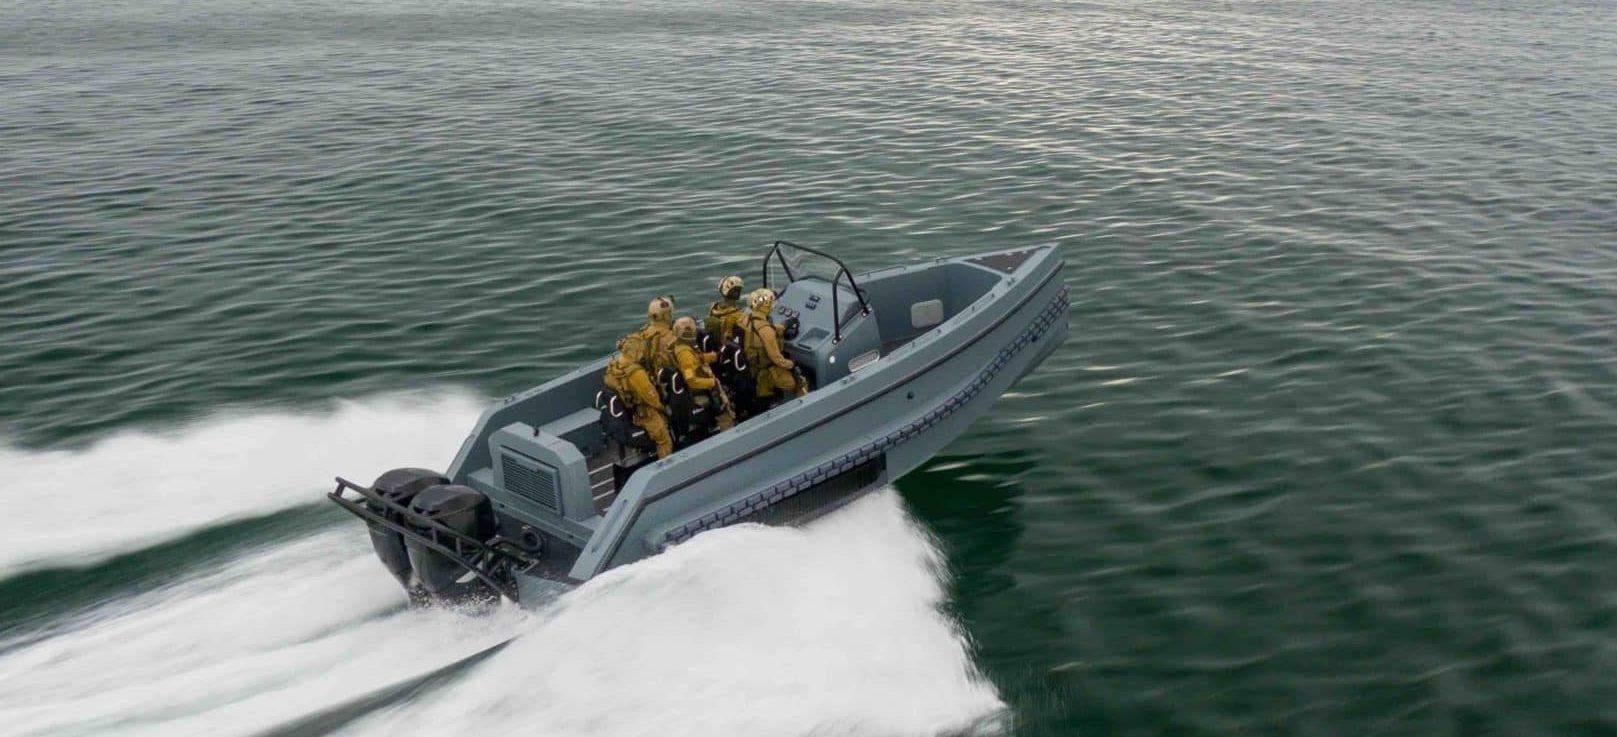 Iguana Pro Interceptor running at sea